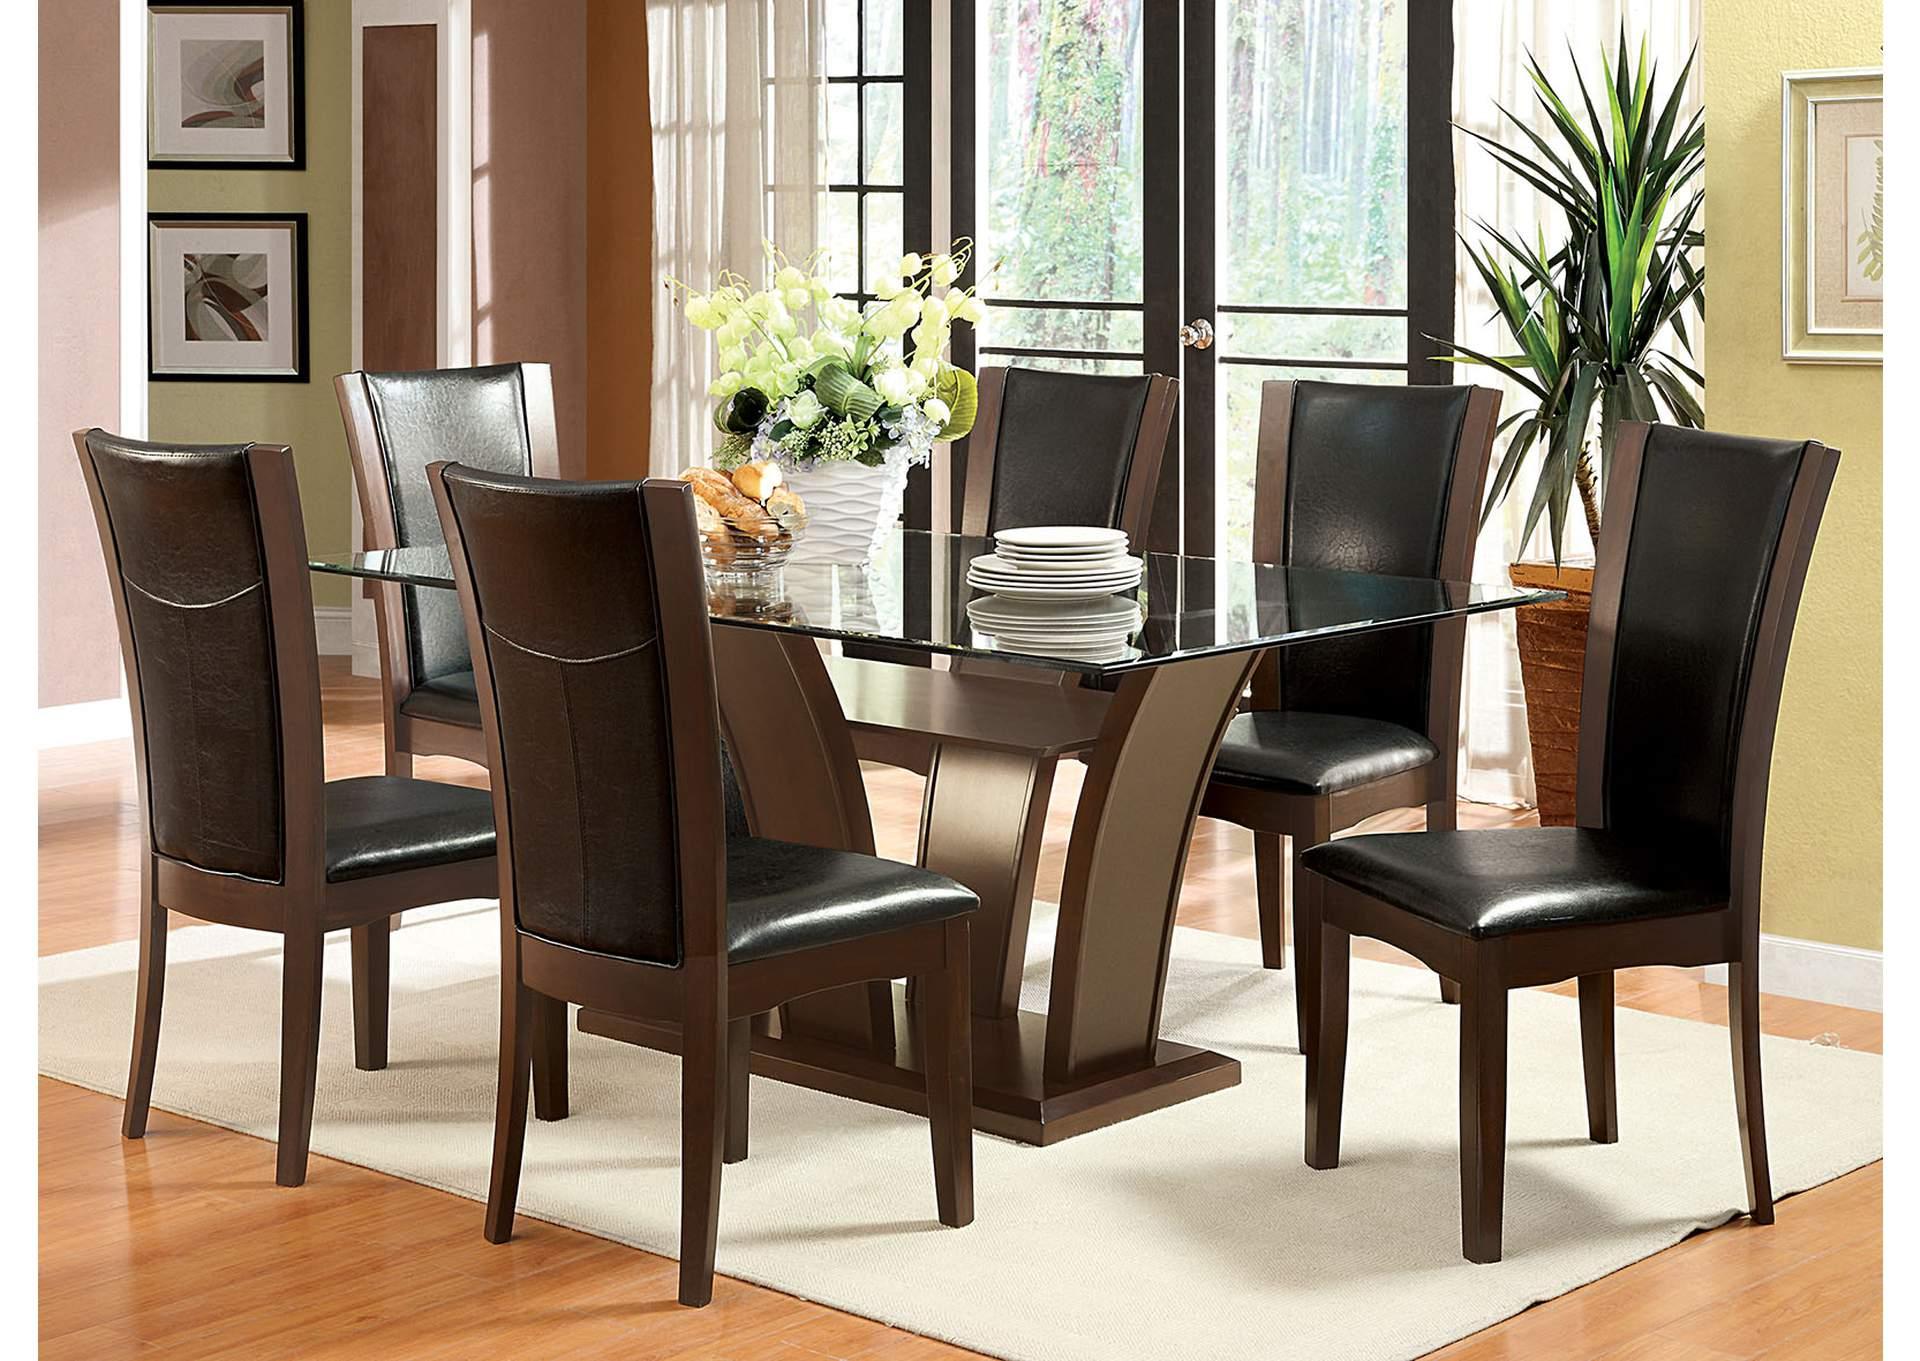 Manhattan L Dining Table W 6 Side Chair Mariem Furniture